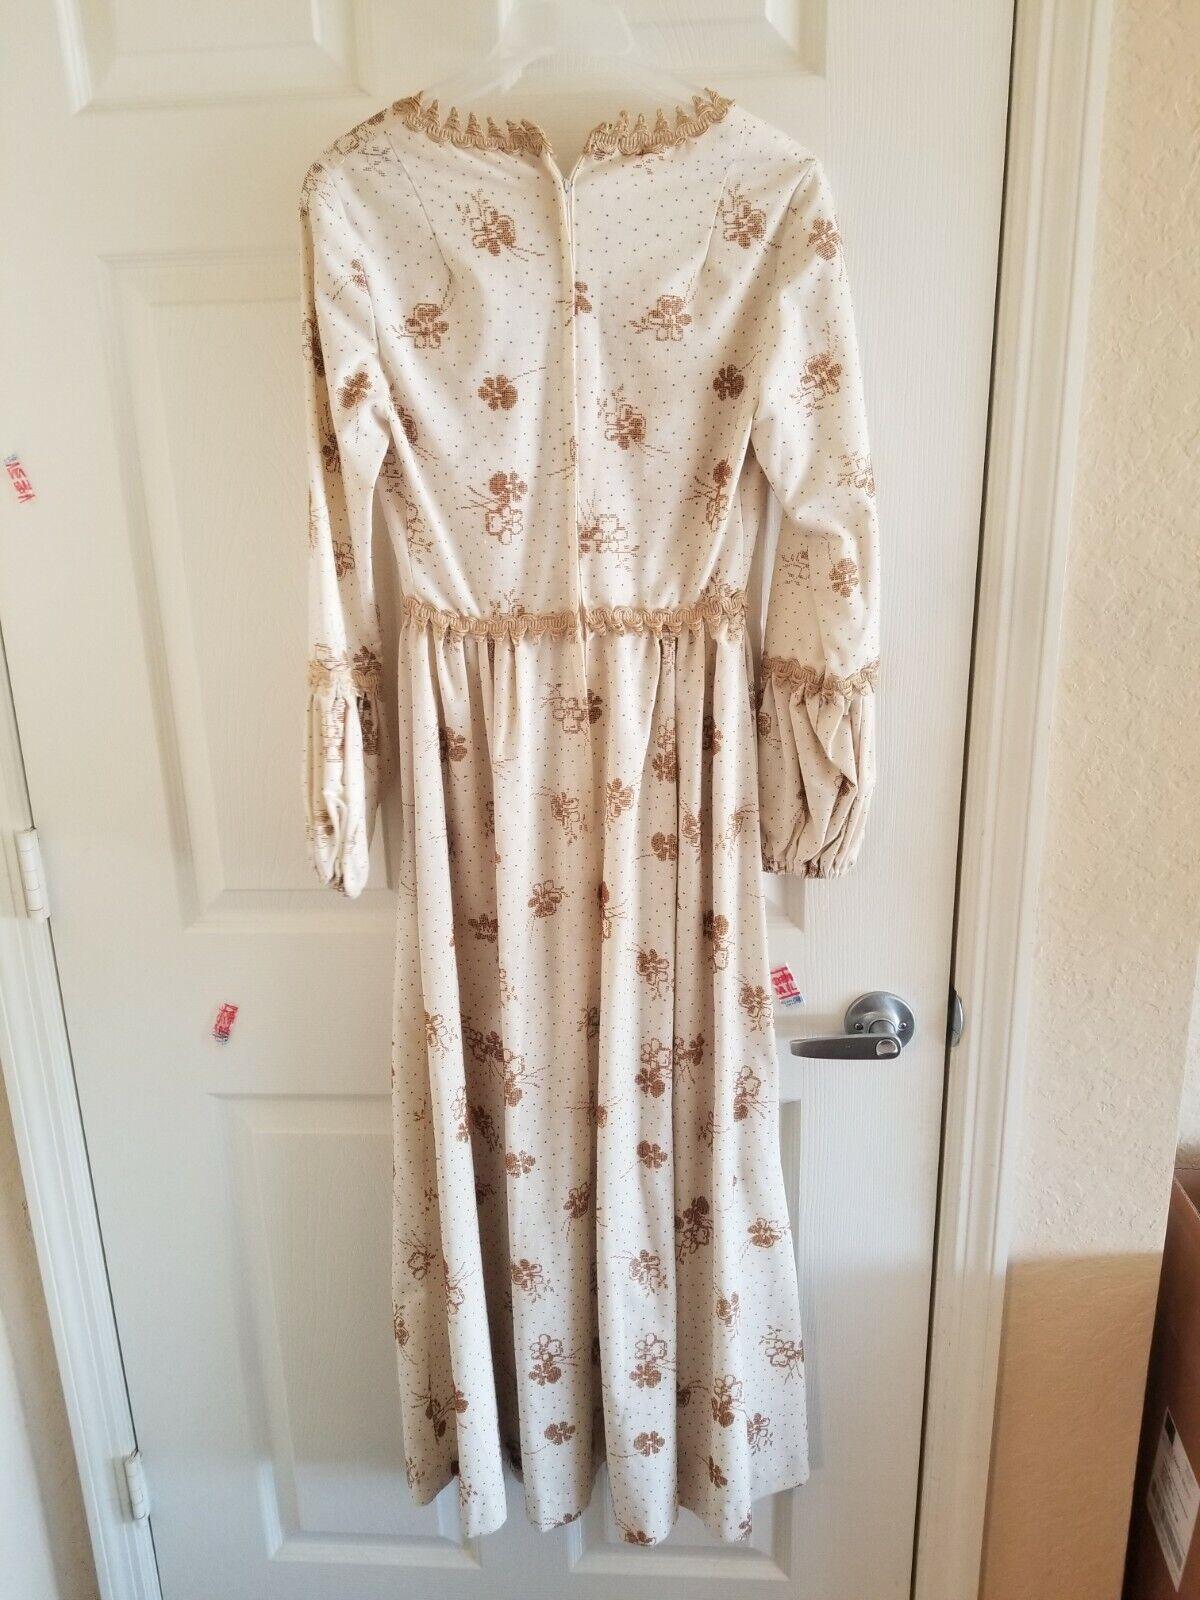 Gunne Sax Renaissance Dress - image 3